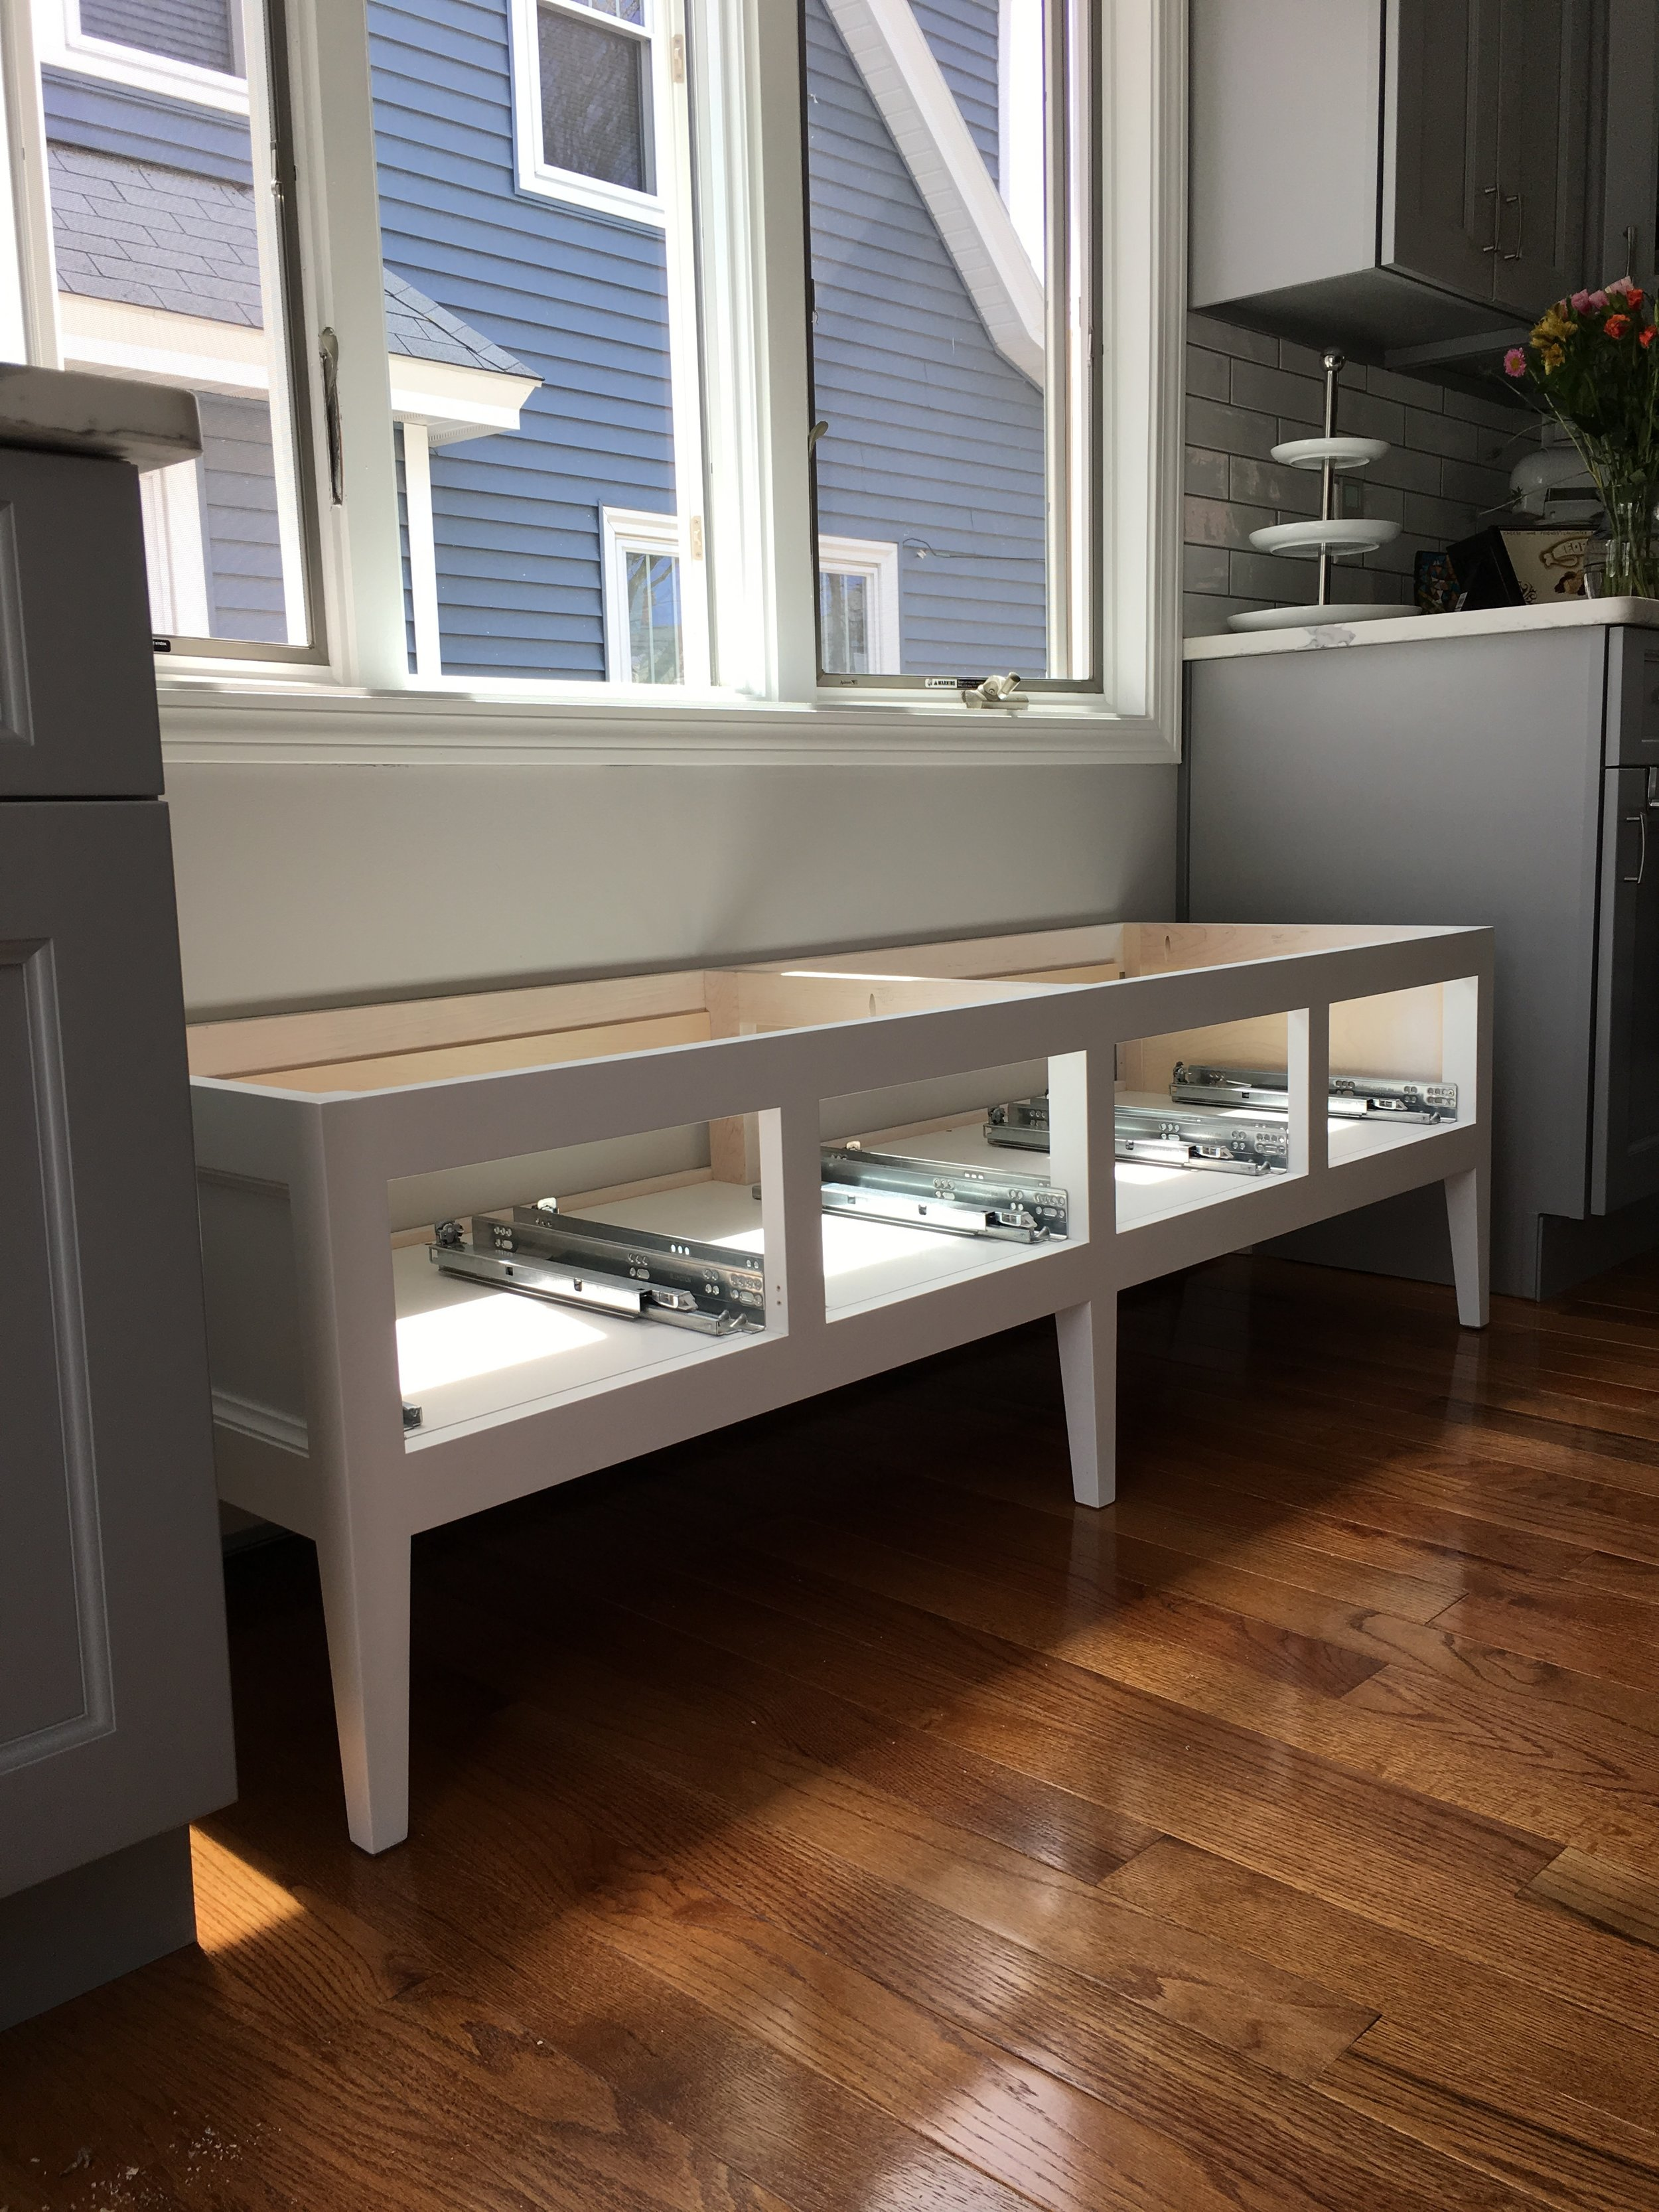 Hone Design Co._Dorchester Bench 10